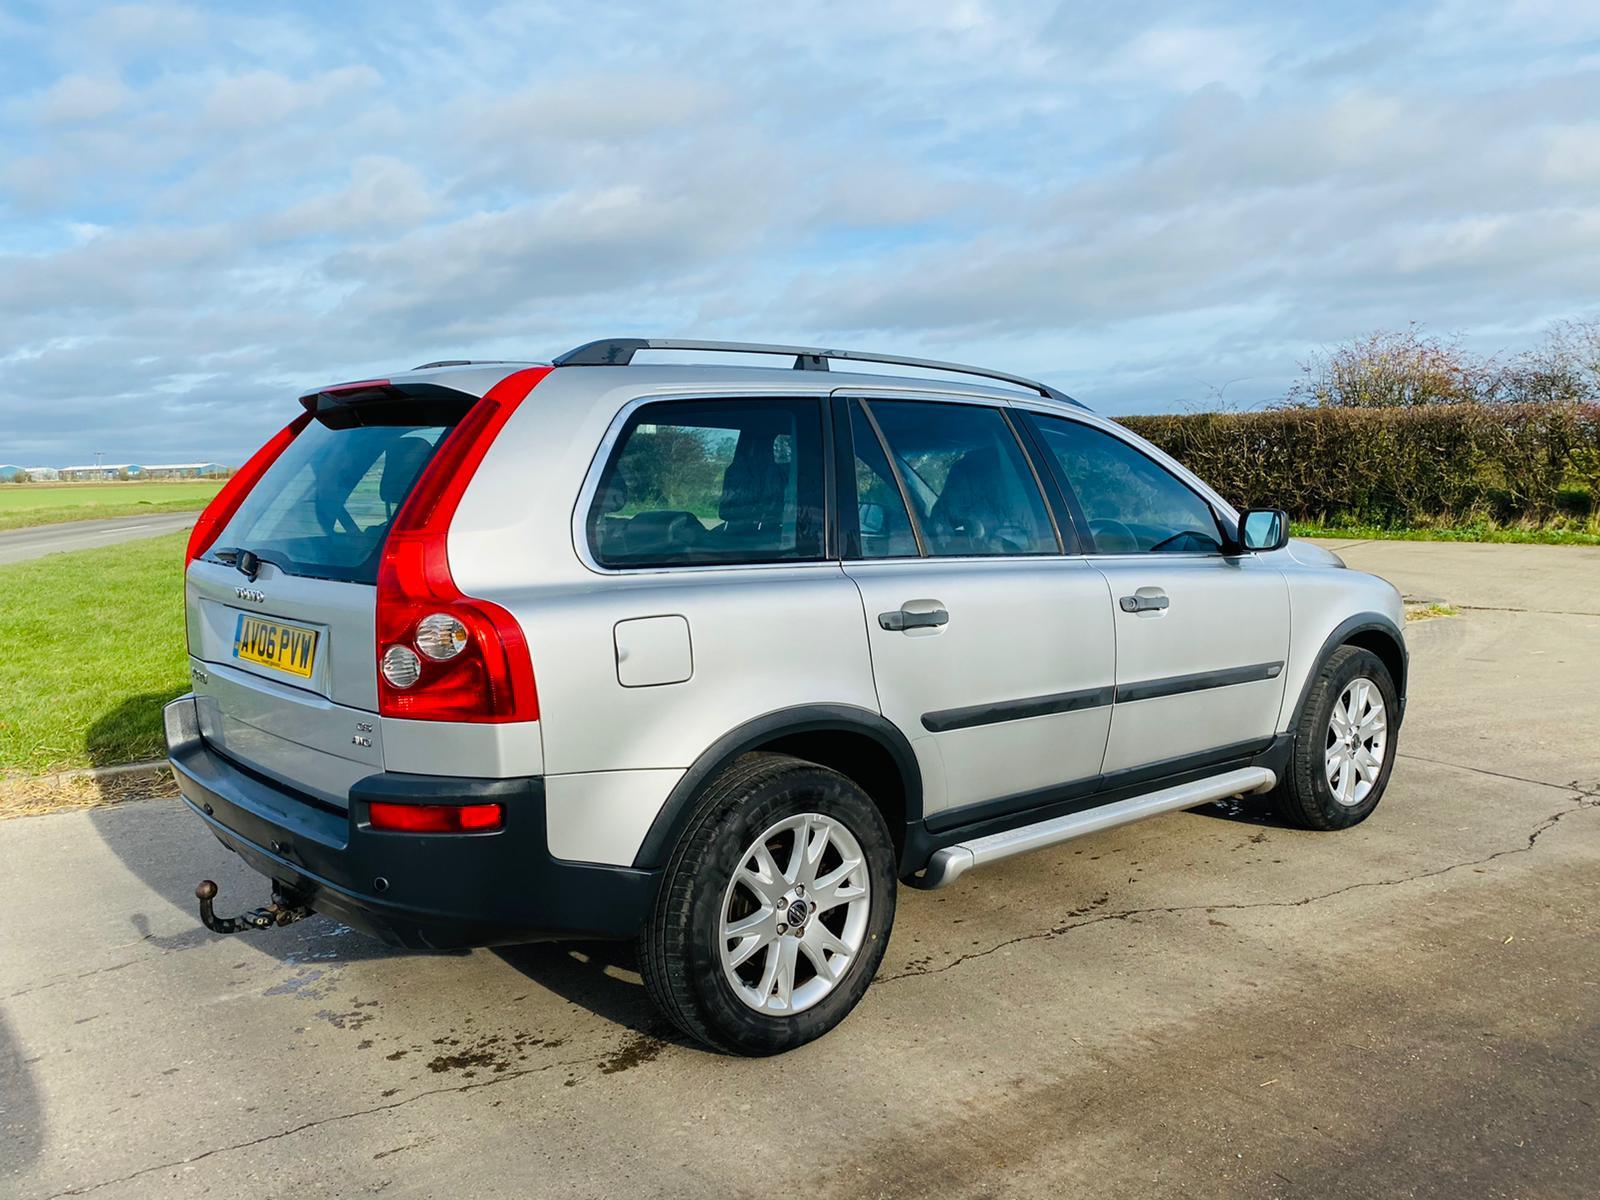 Volvo XC90 2.4 D5 185bhp SE Geartronic Auto 2006 06 Reg - 7 Seats - Air con - Top Spec - Image 6 of 47